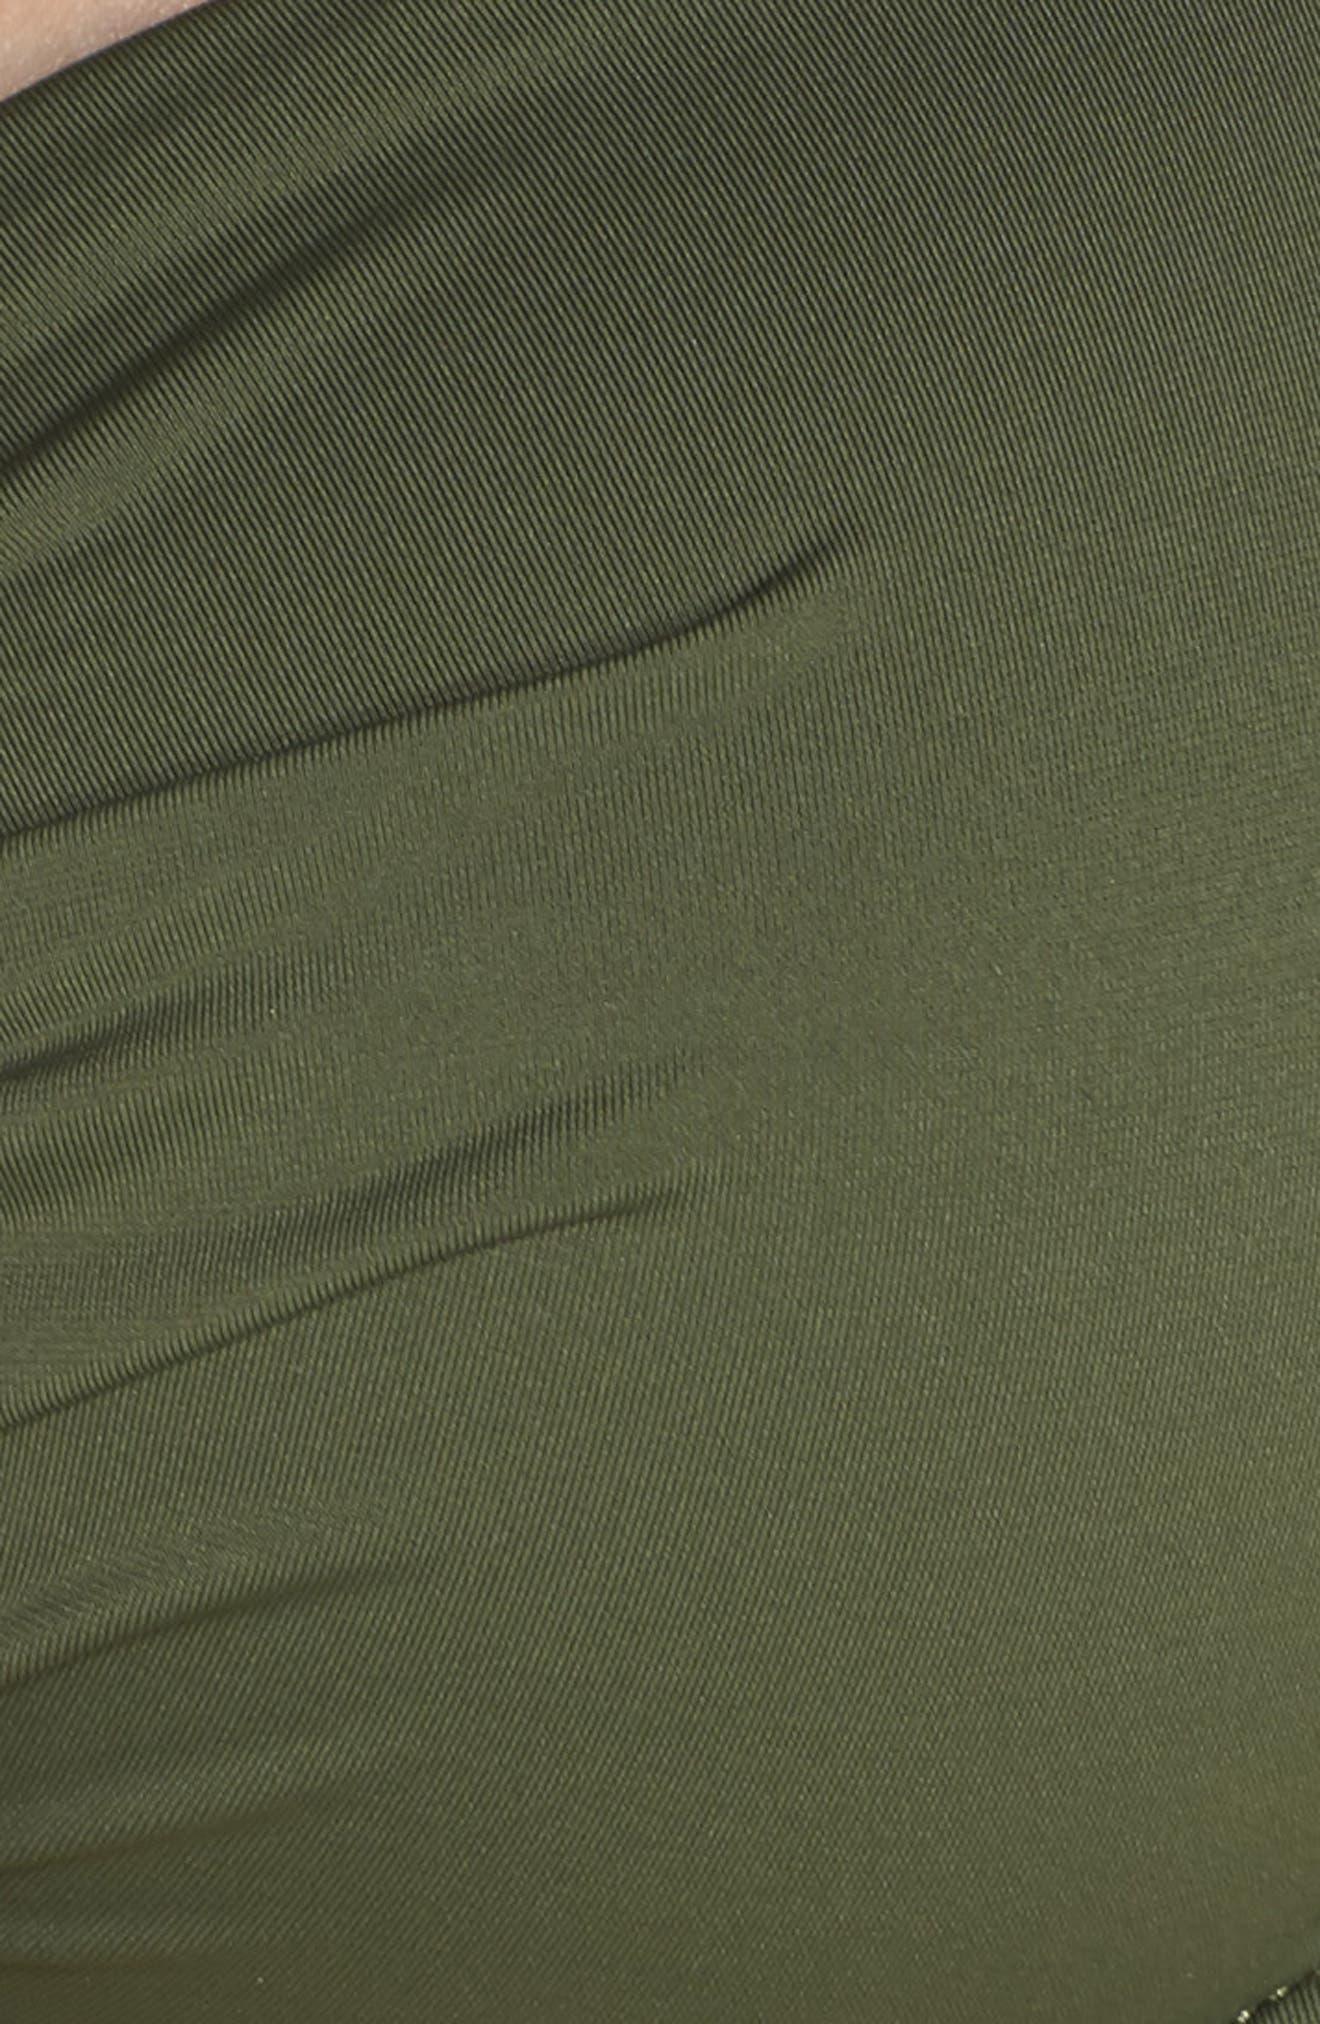 Underwire Halter Bikini Top,                             Alternate thumbnail 5, color,                             DARK TEA LEAF